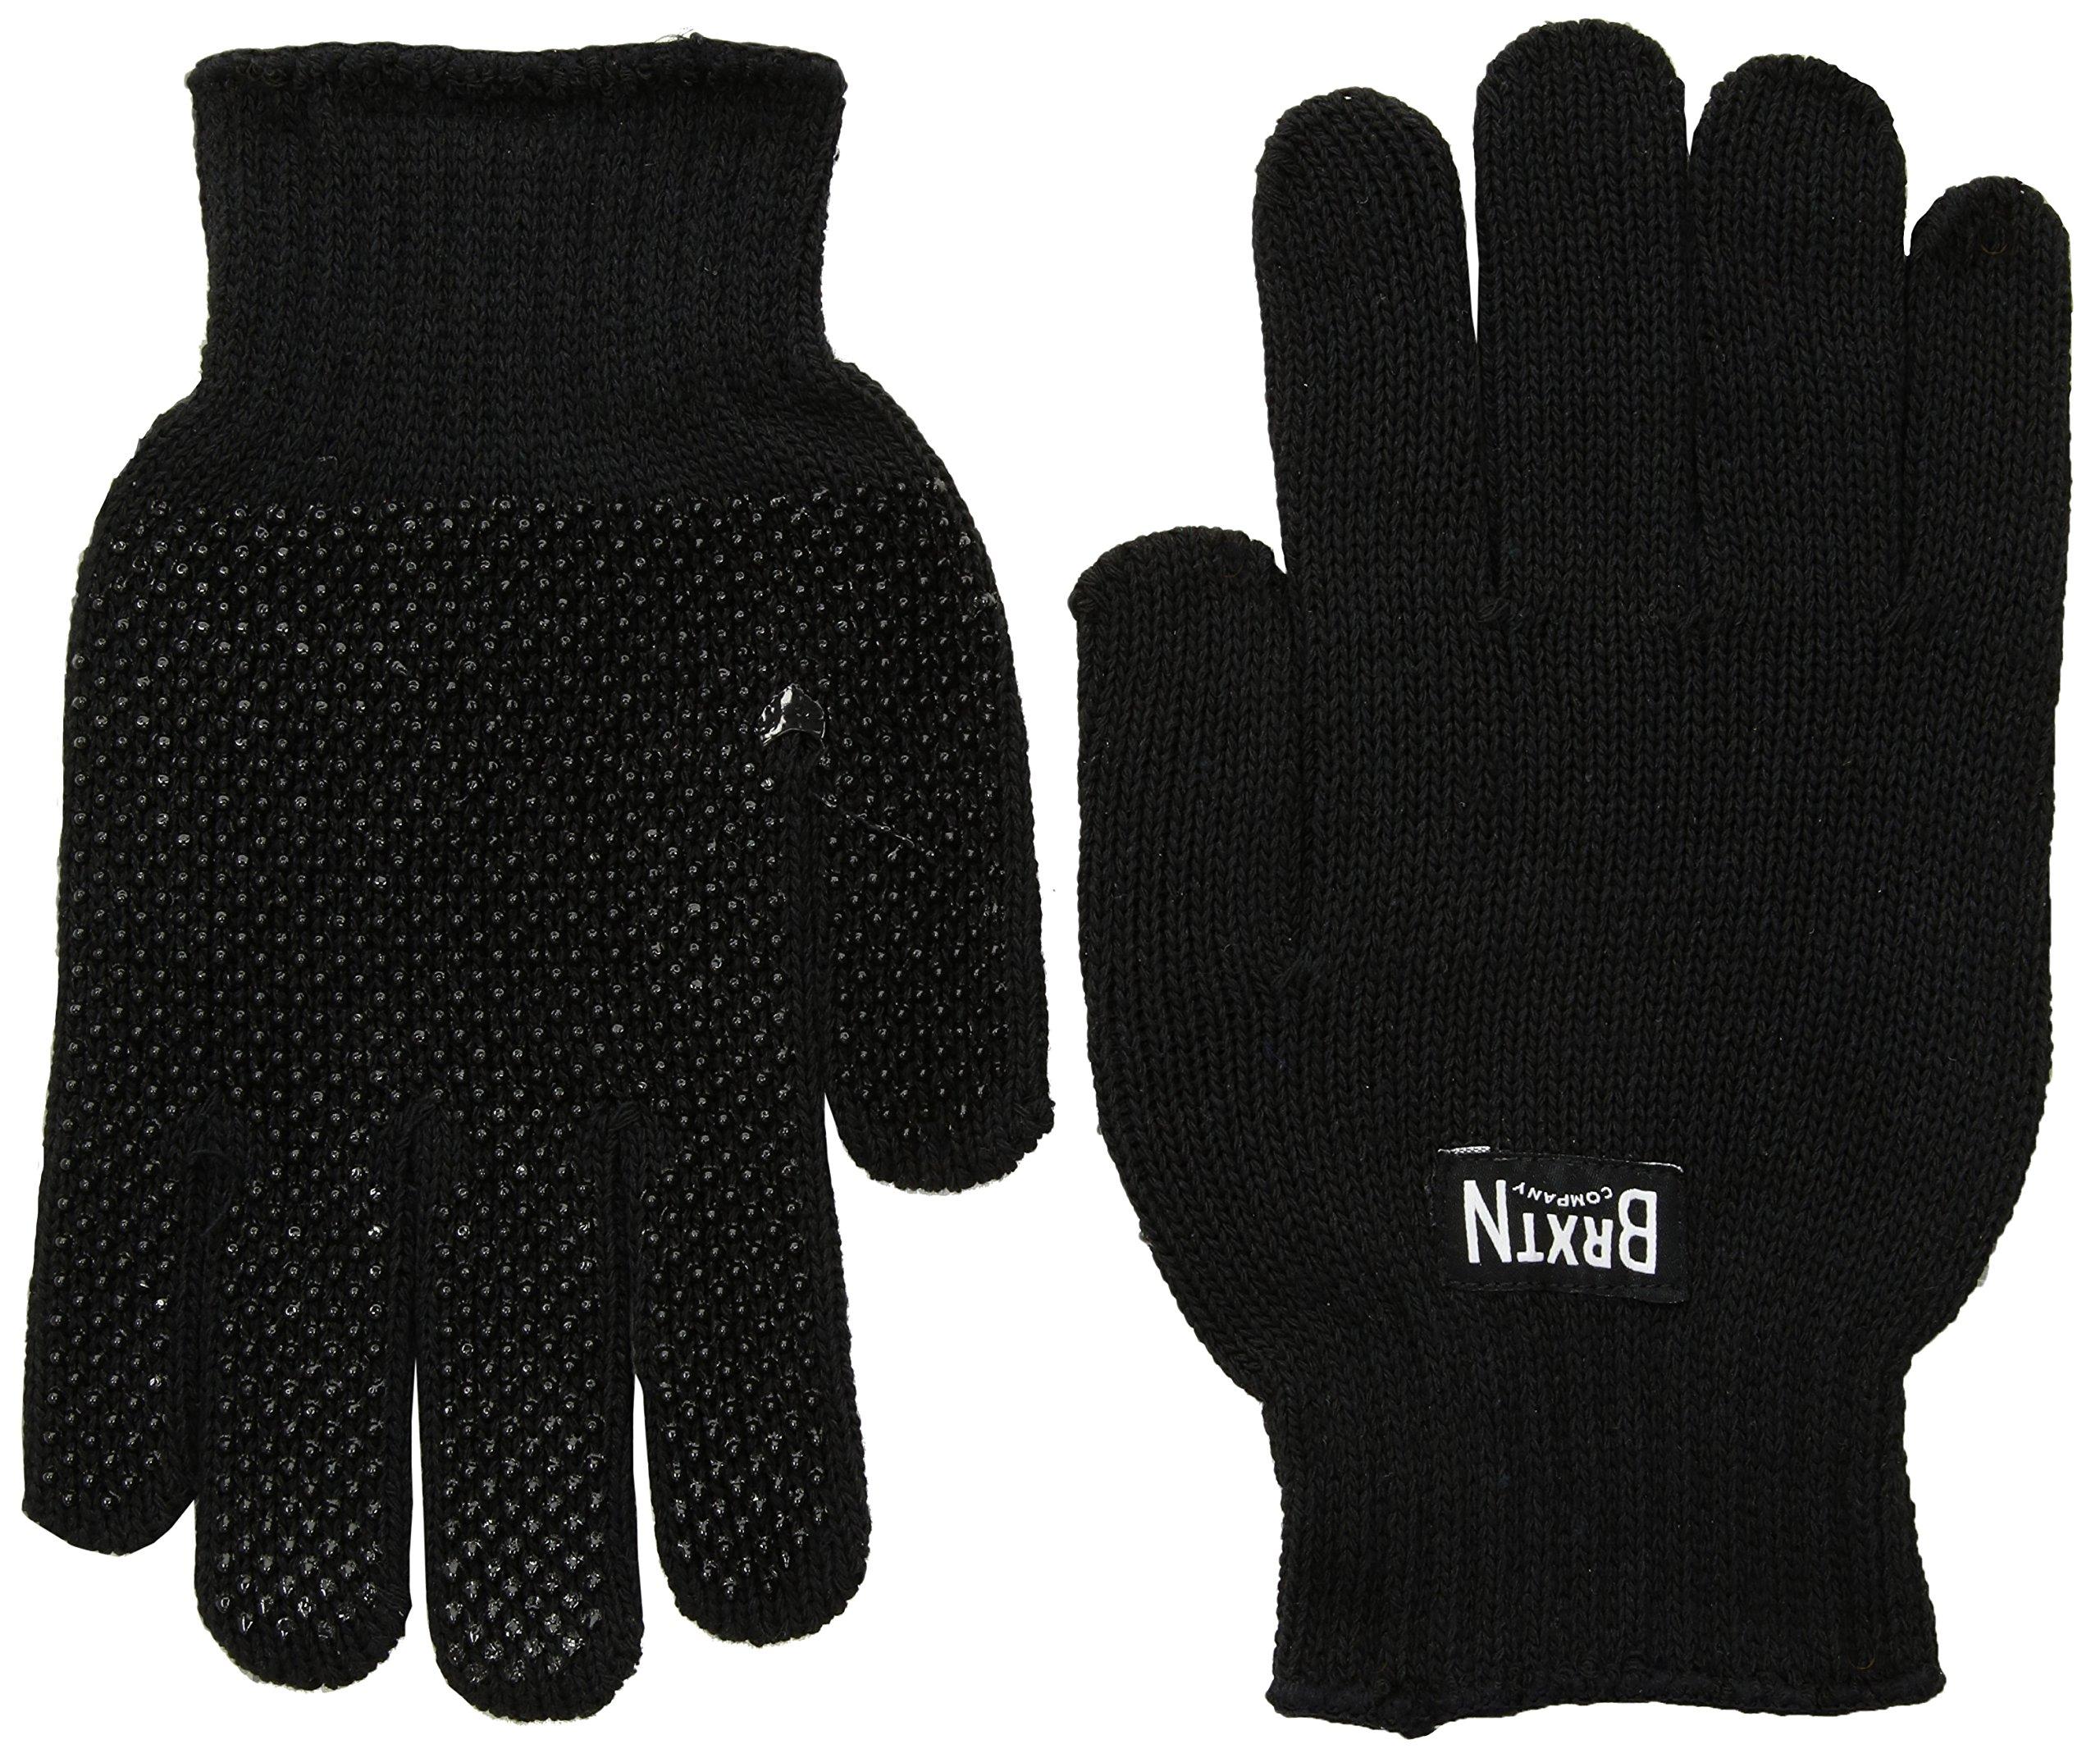 Brixton Men's Langley Rubber Grip Gloves, Black, One Size